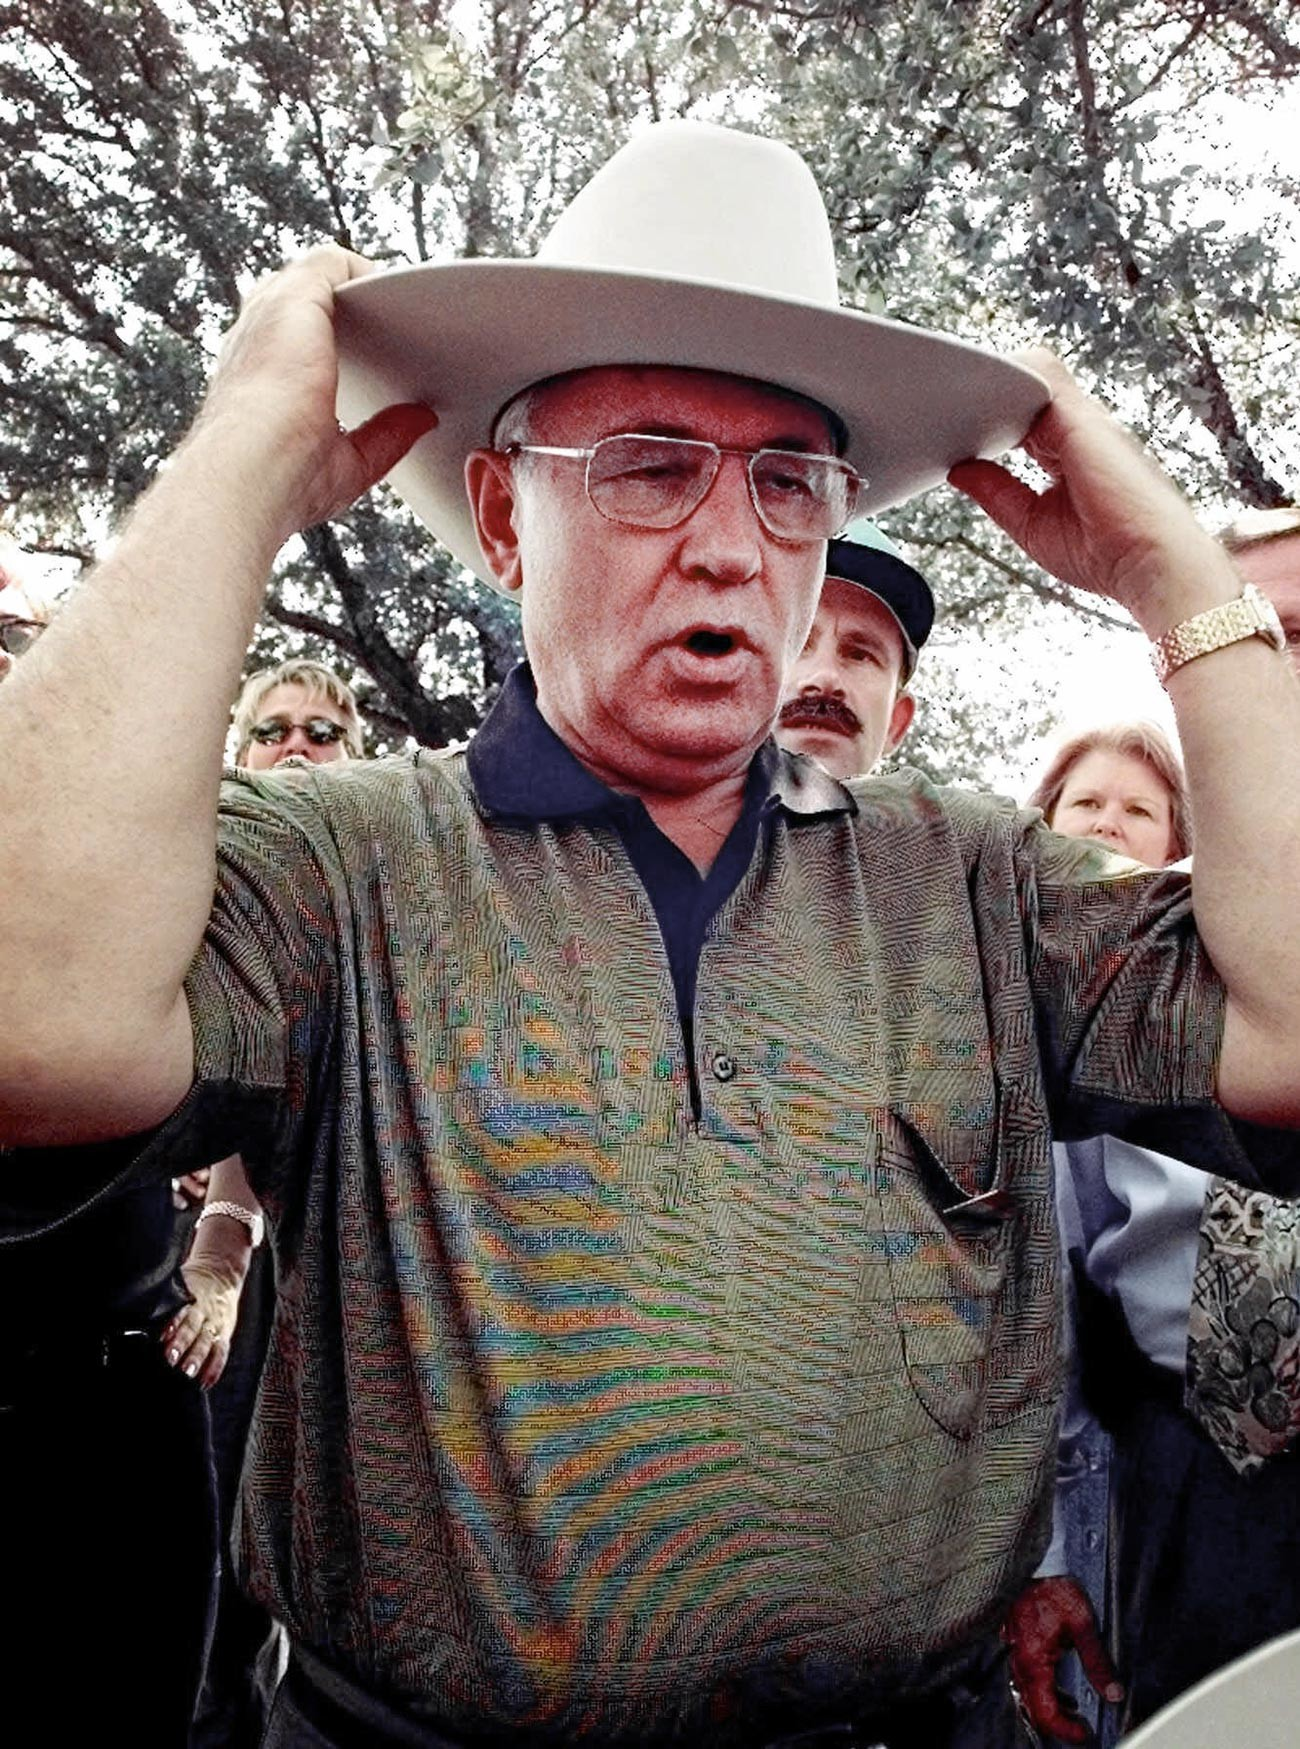 Mantan Presiden Uni Soviet Mikhail Gorbachev mengenakan topi koboi saat mengunjungi State Fair of Texas di Dallas, AS, 1998.